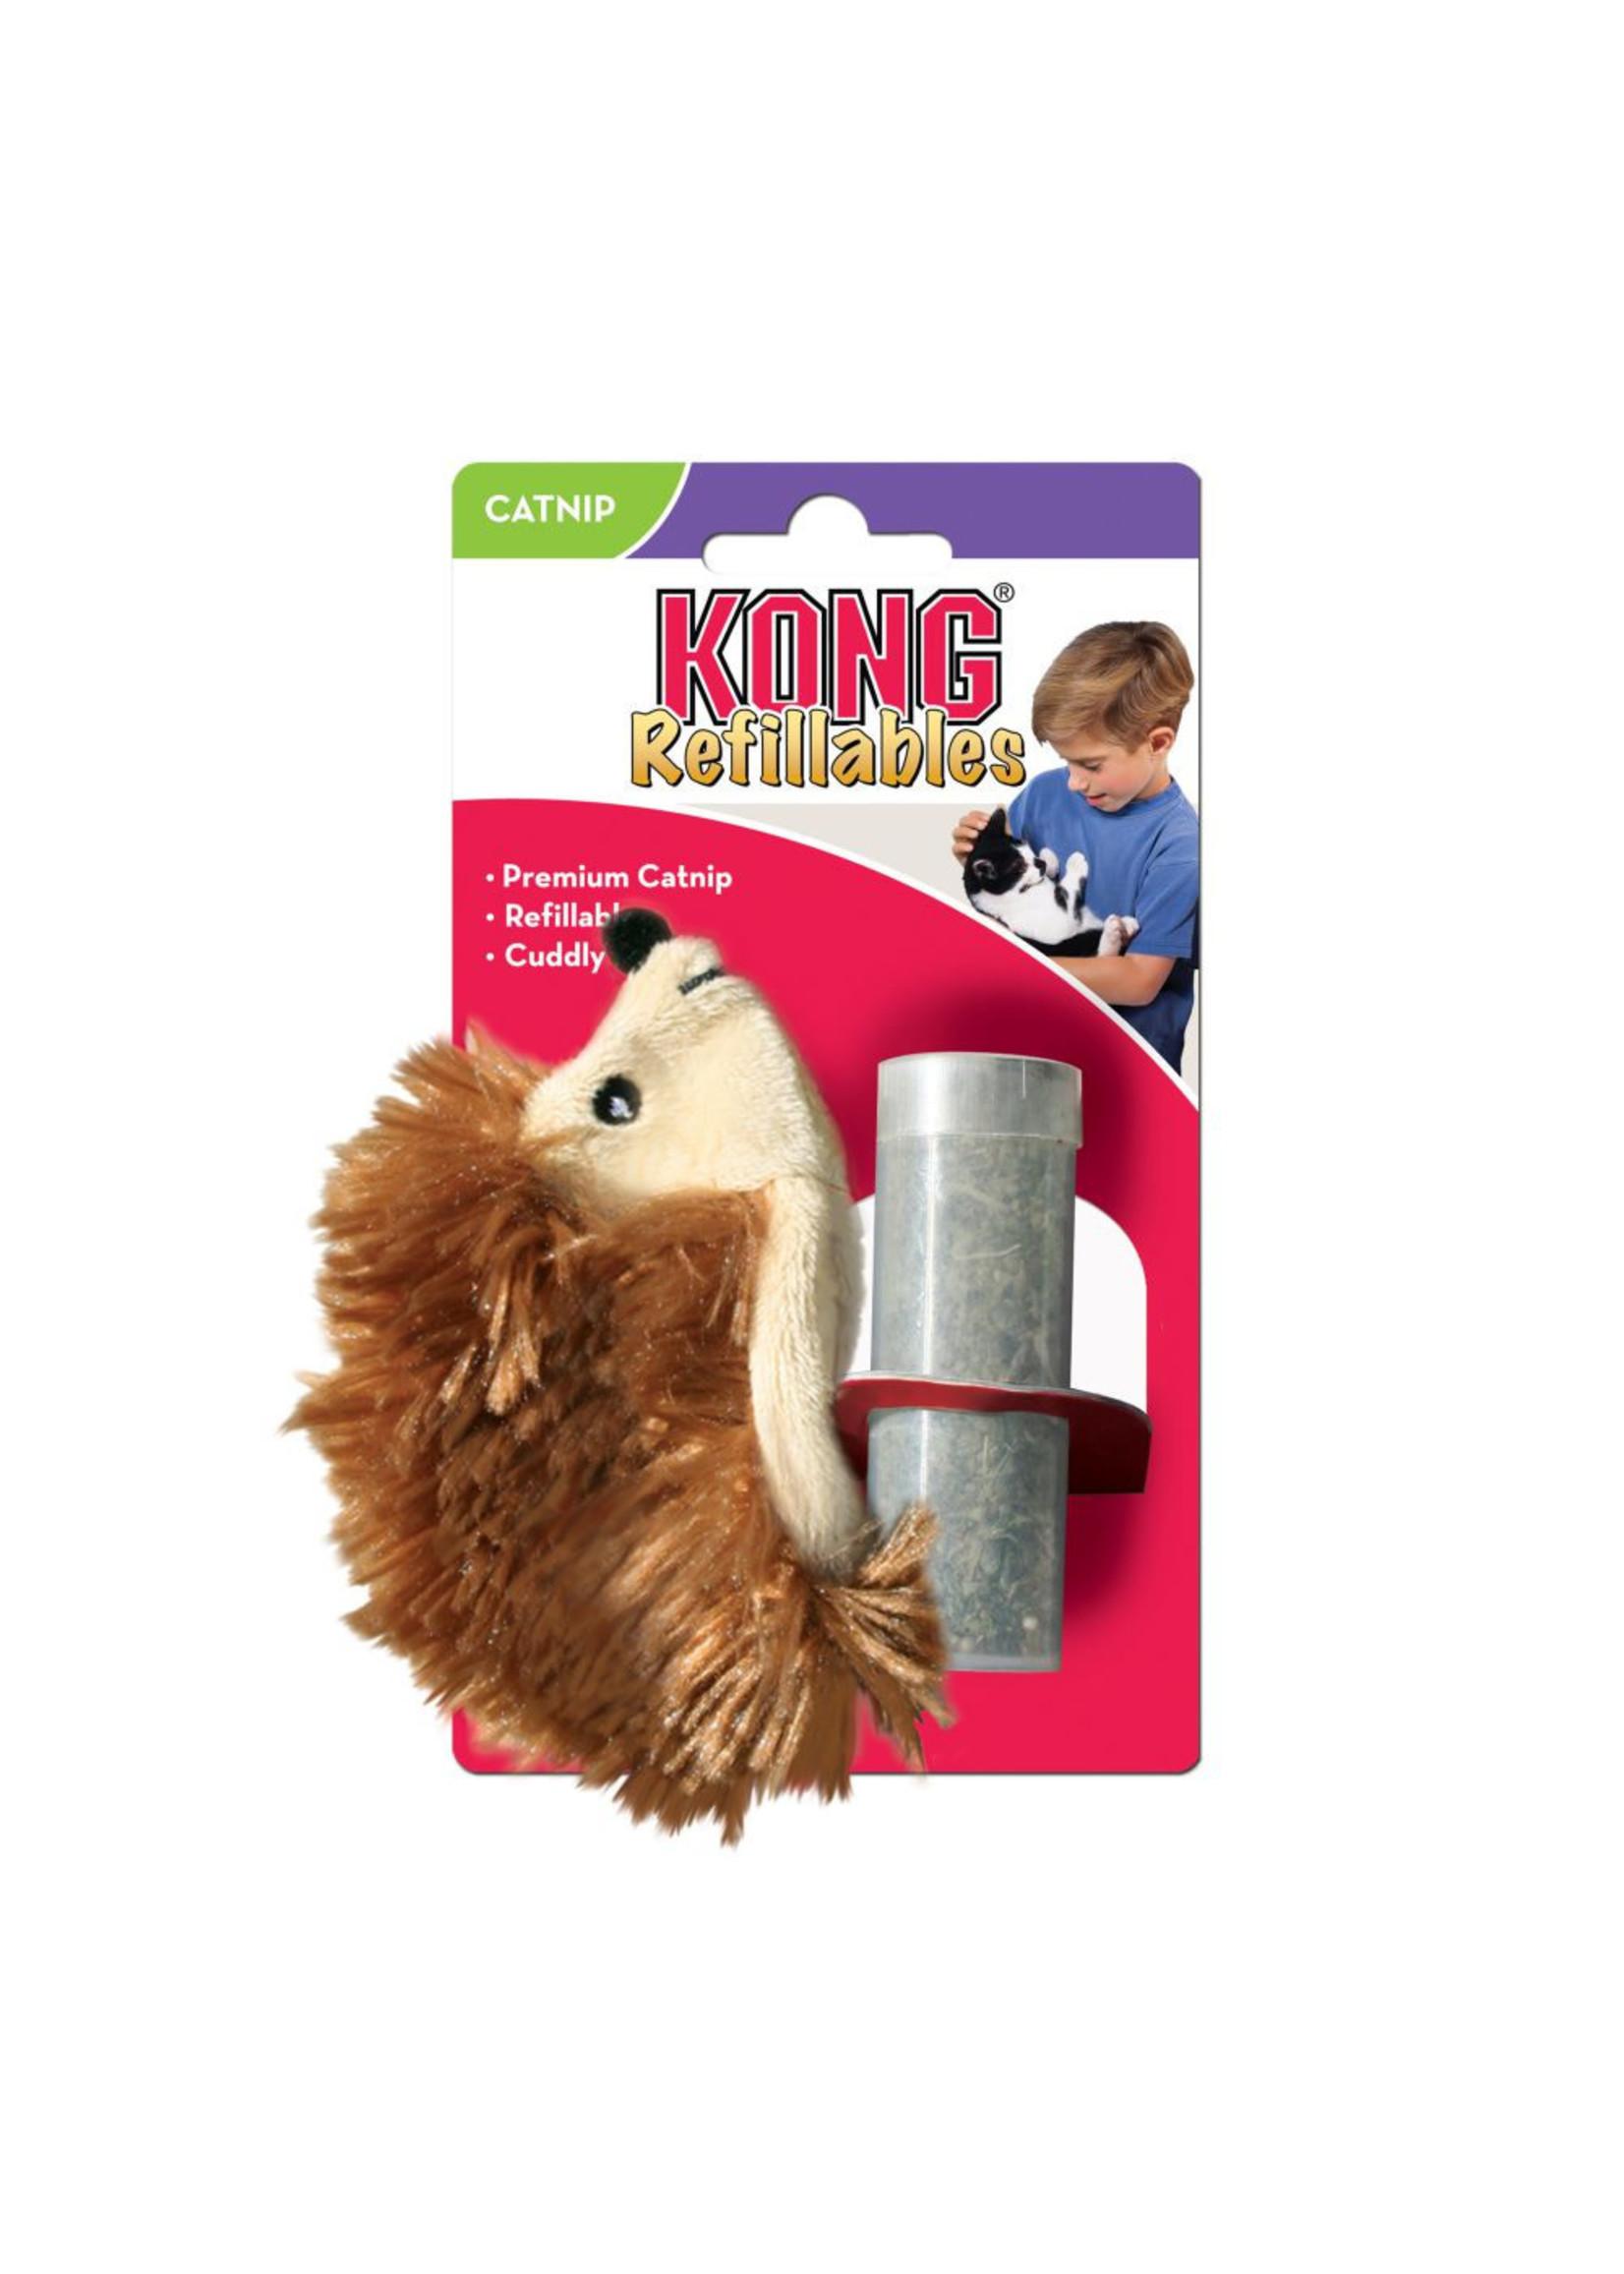 Kong Kong Catnip Hedgehog